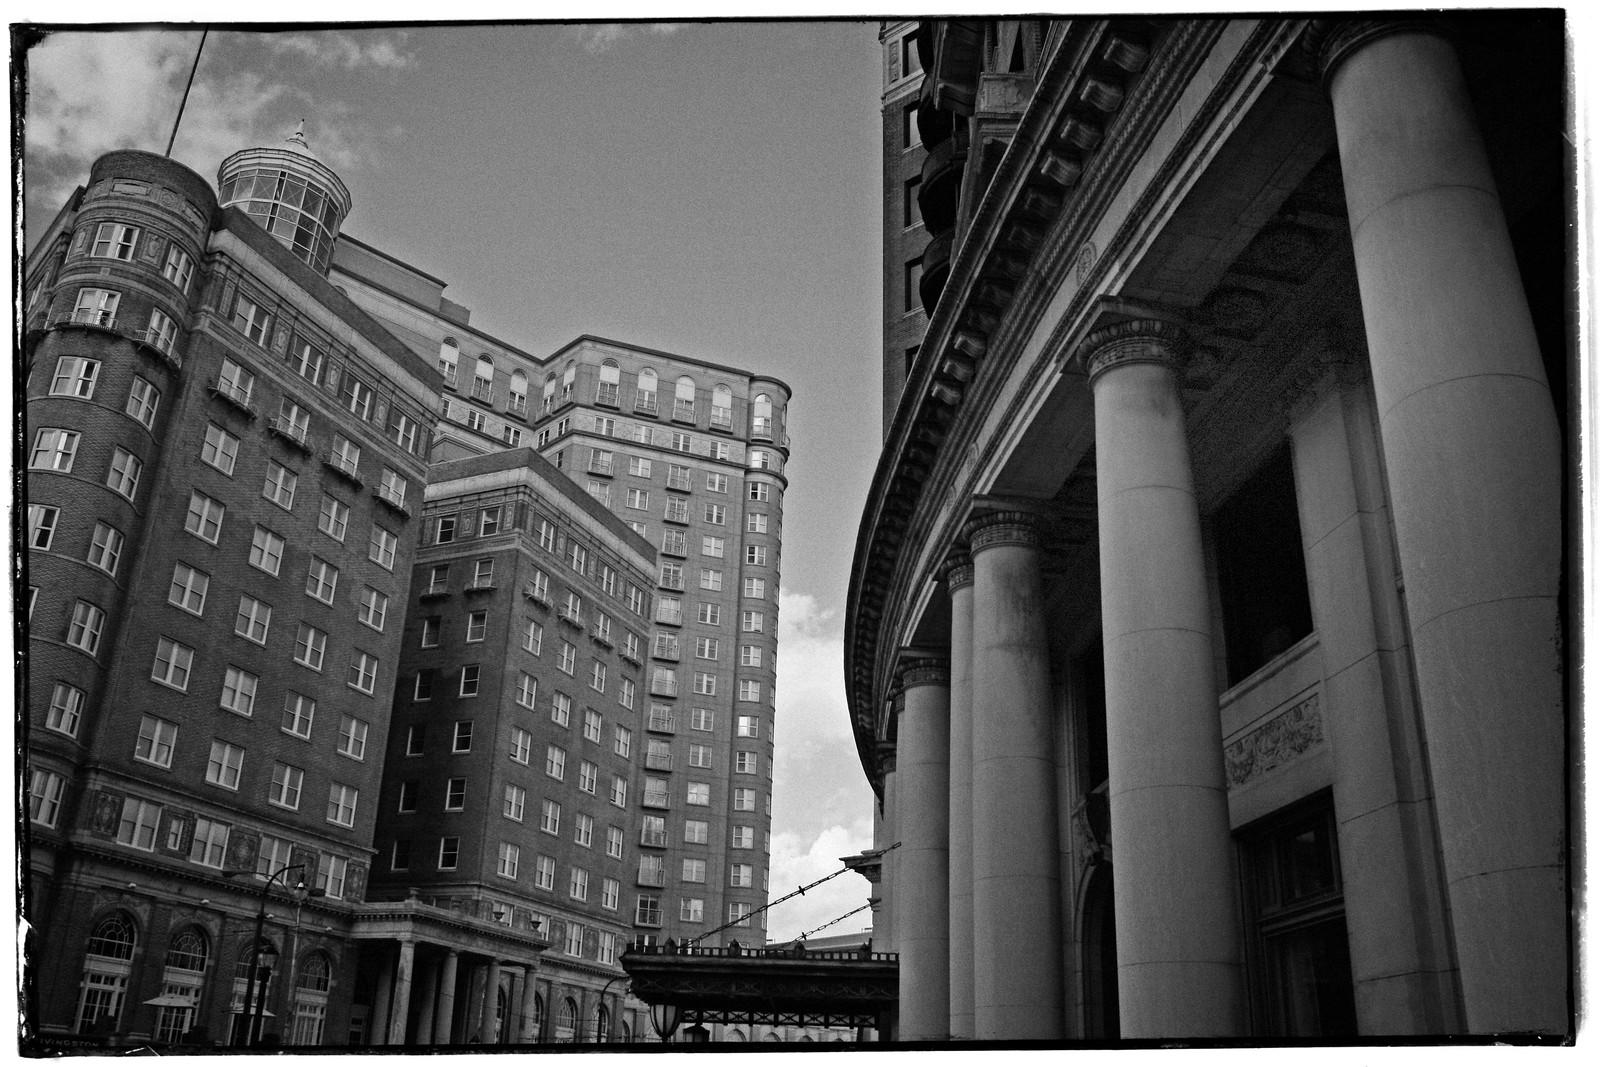 Georgian Terrace and Ponce de Leon Apartments, Oct 2012